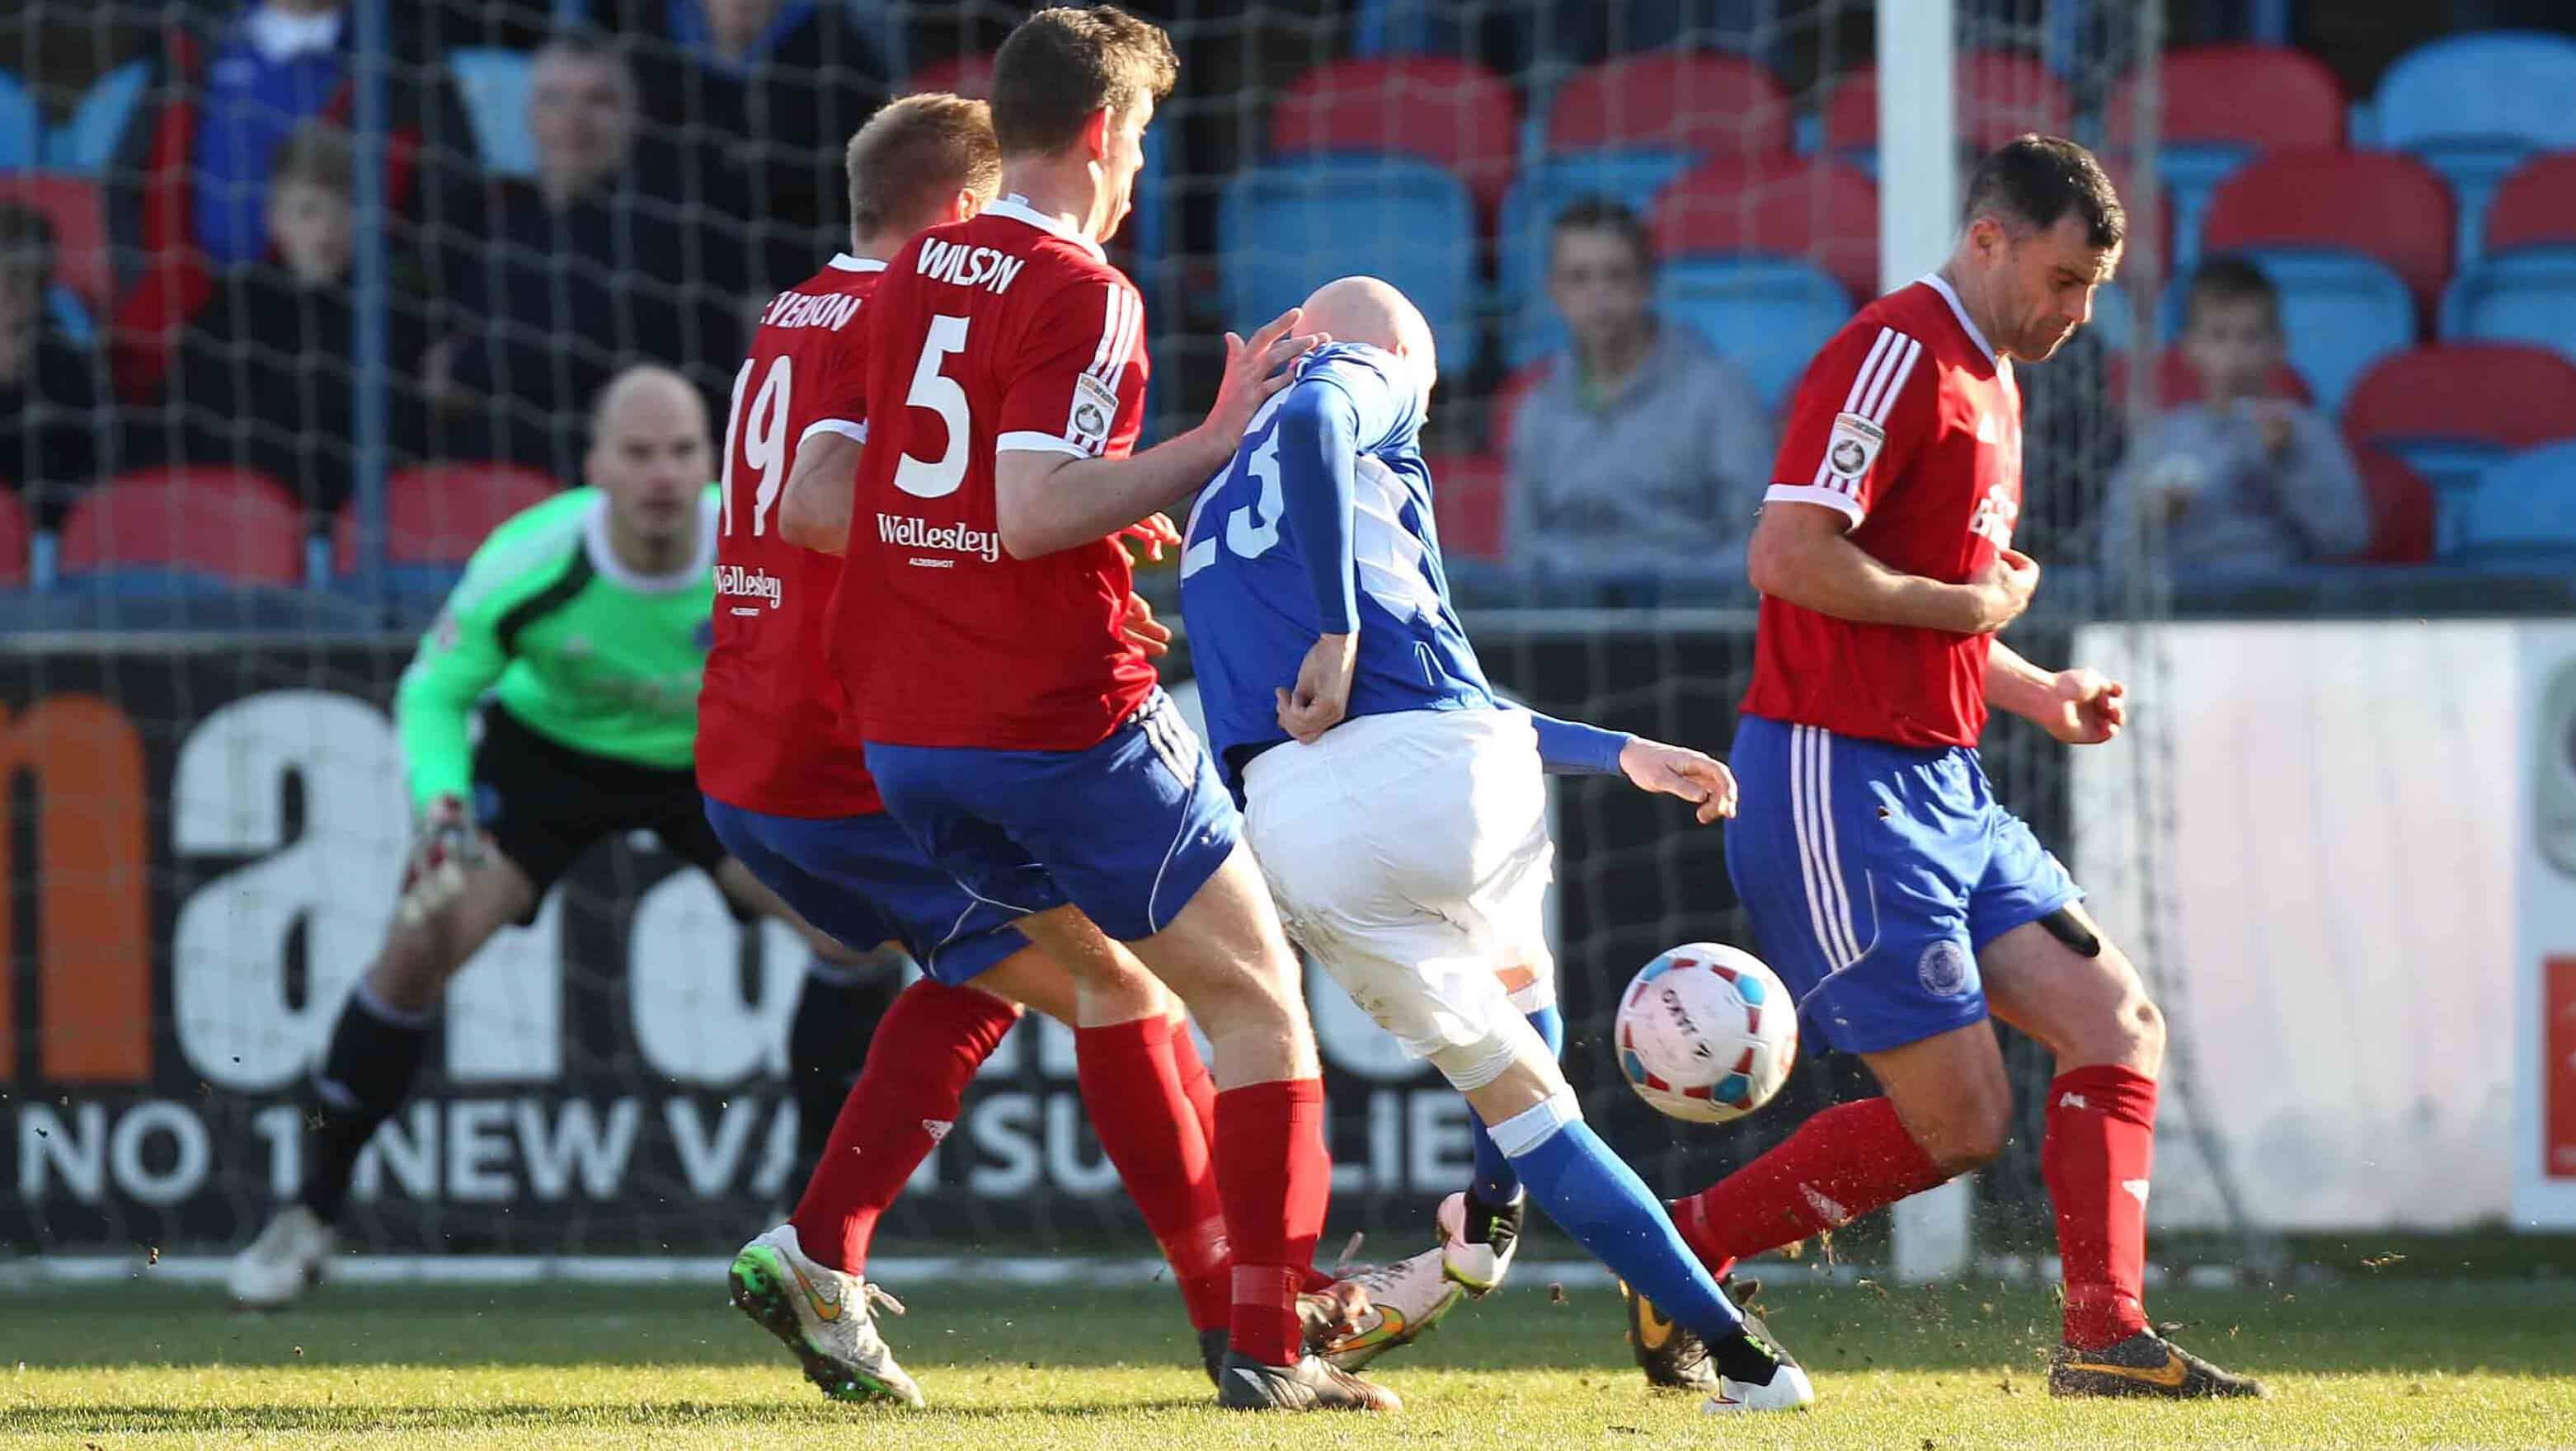 macclesfield v atfc web-15